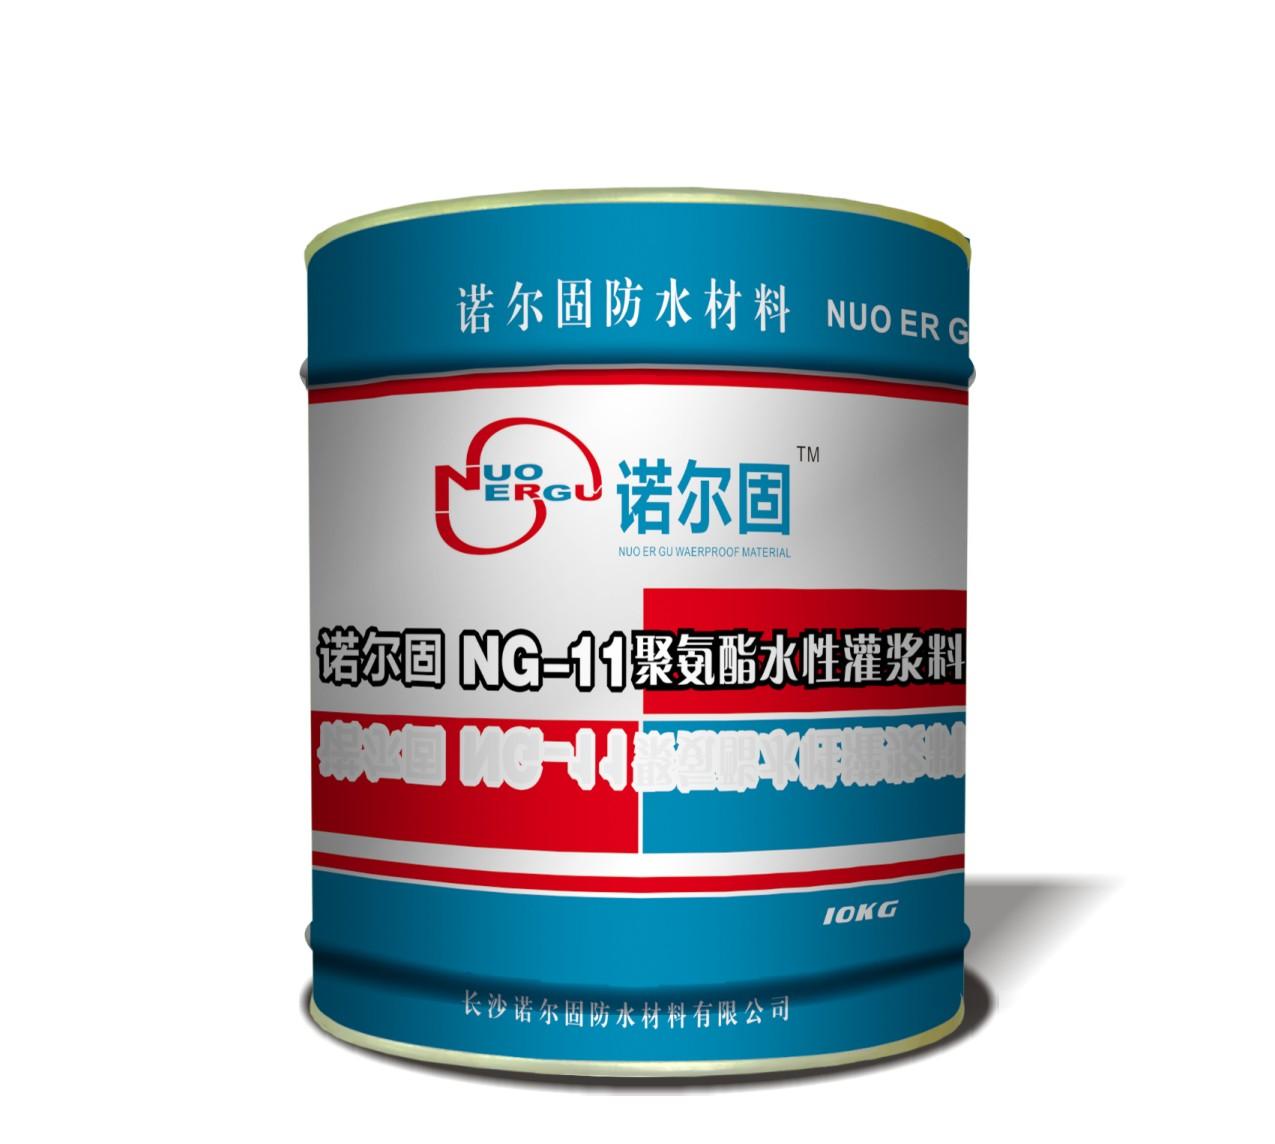 NG-11 聚氨酯水性灌浆料 10kg